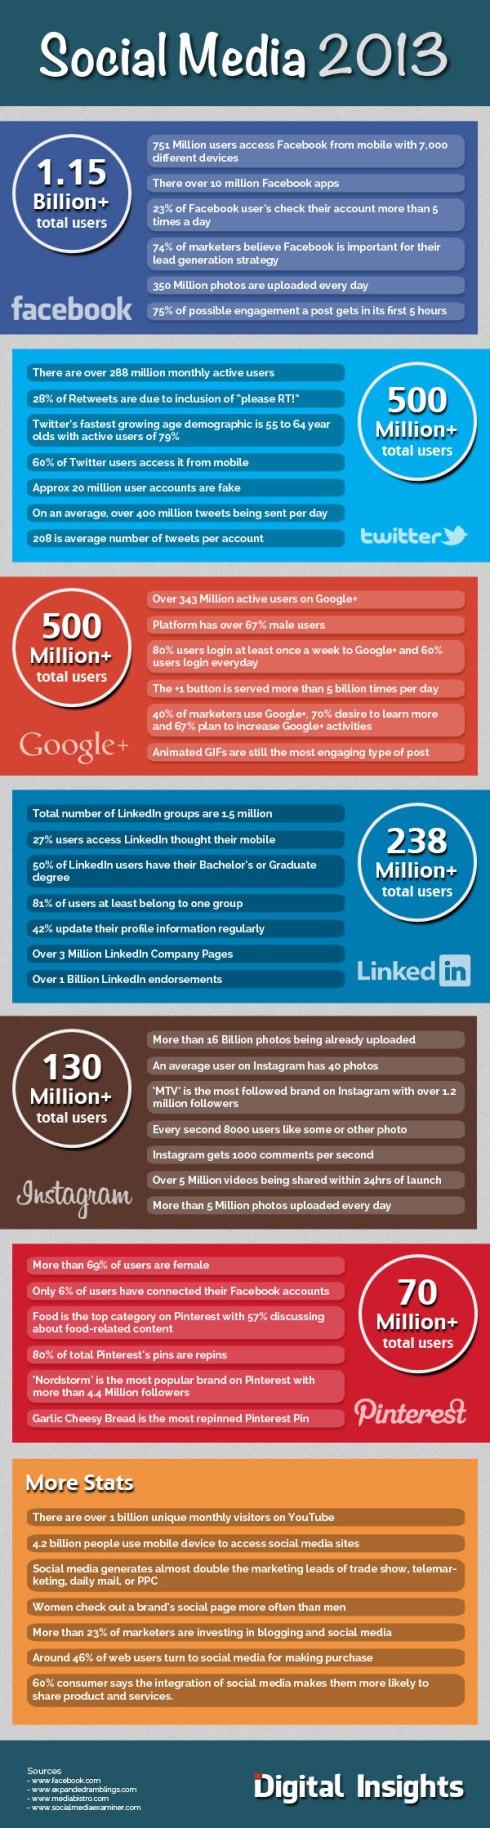 social-media-activities-infographic-2013